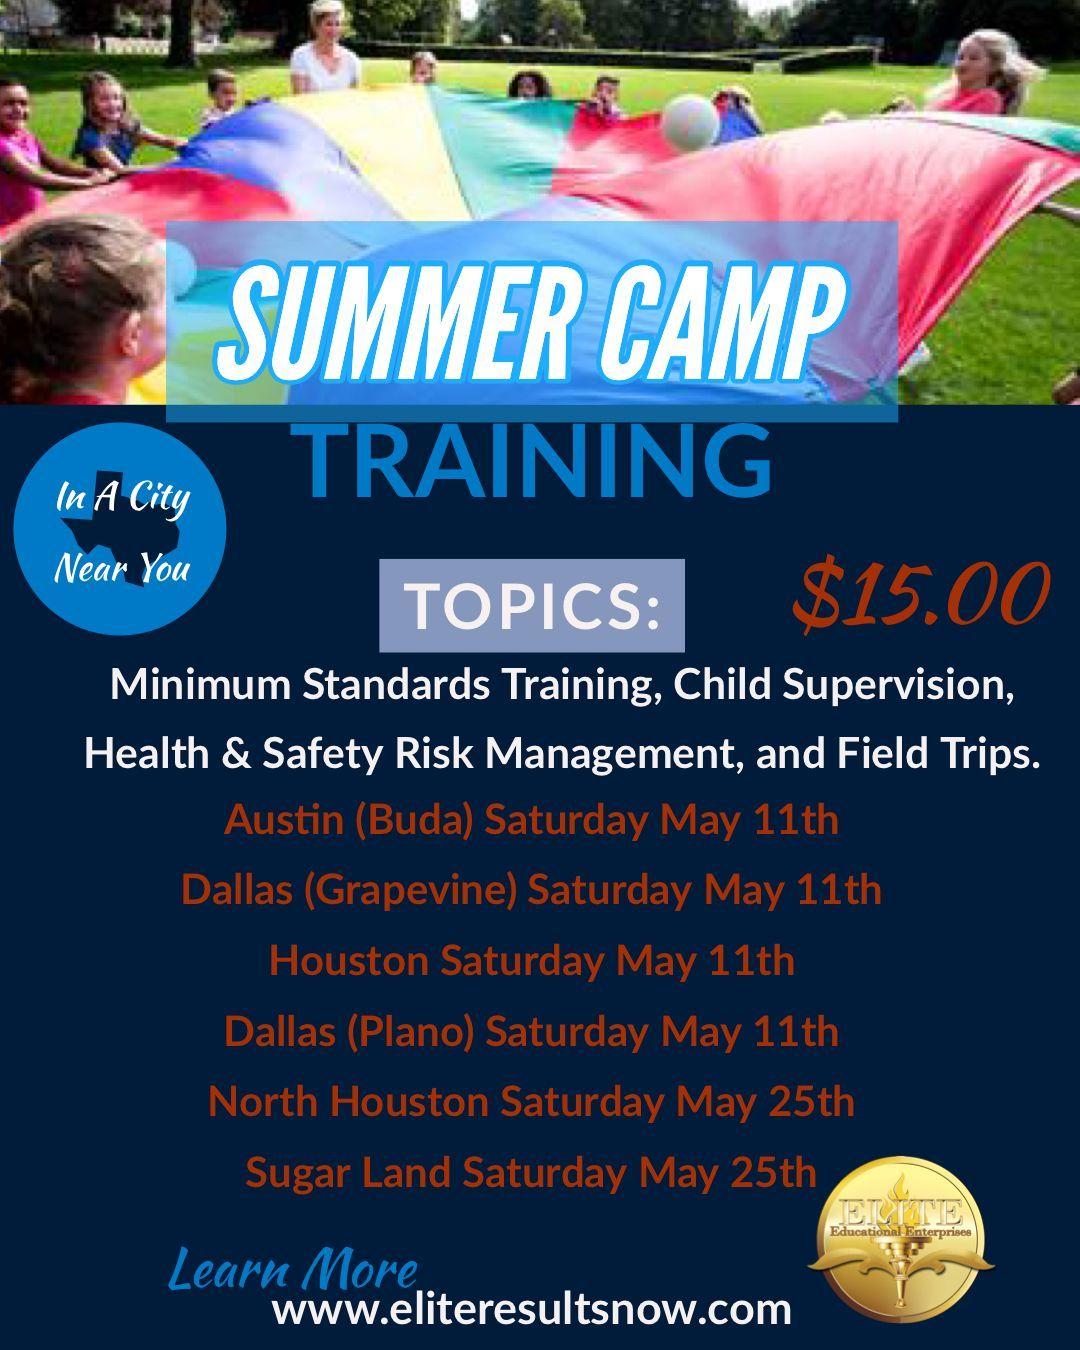 Summer Camp Training 2019